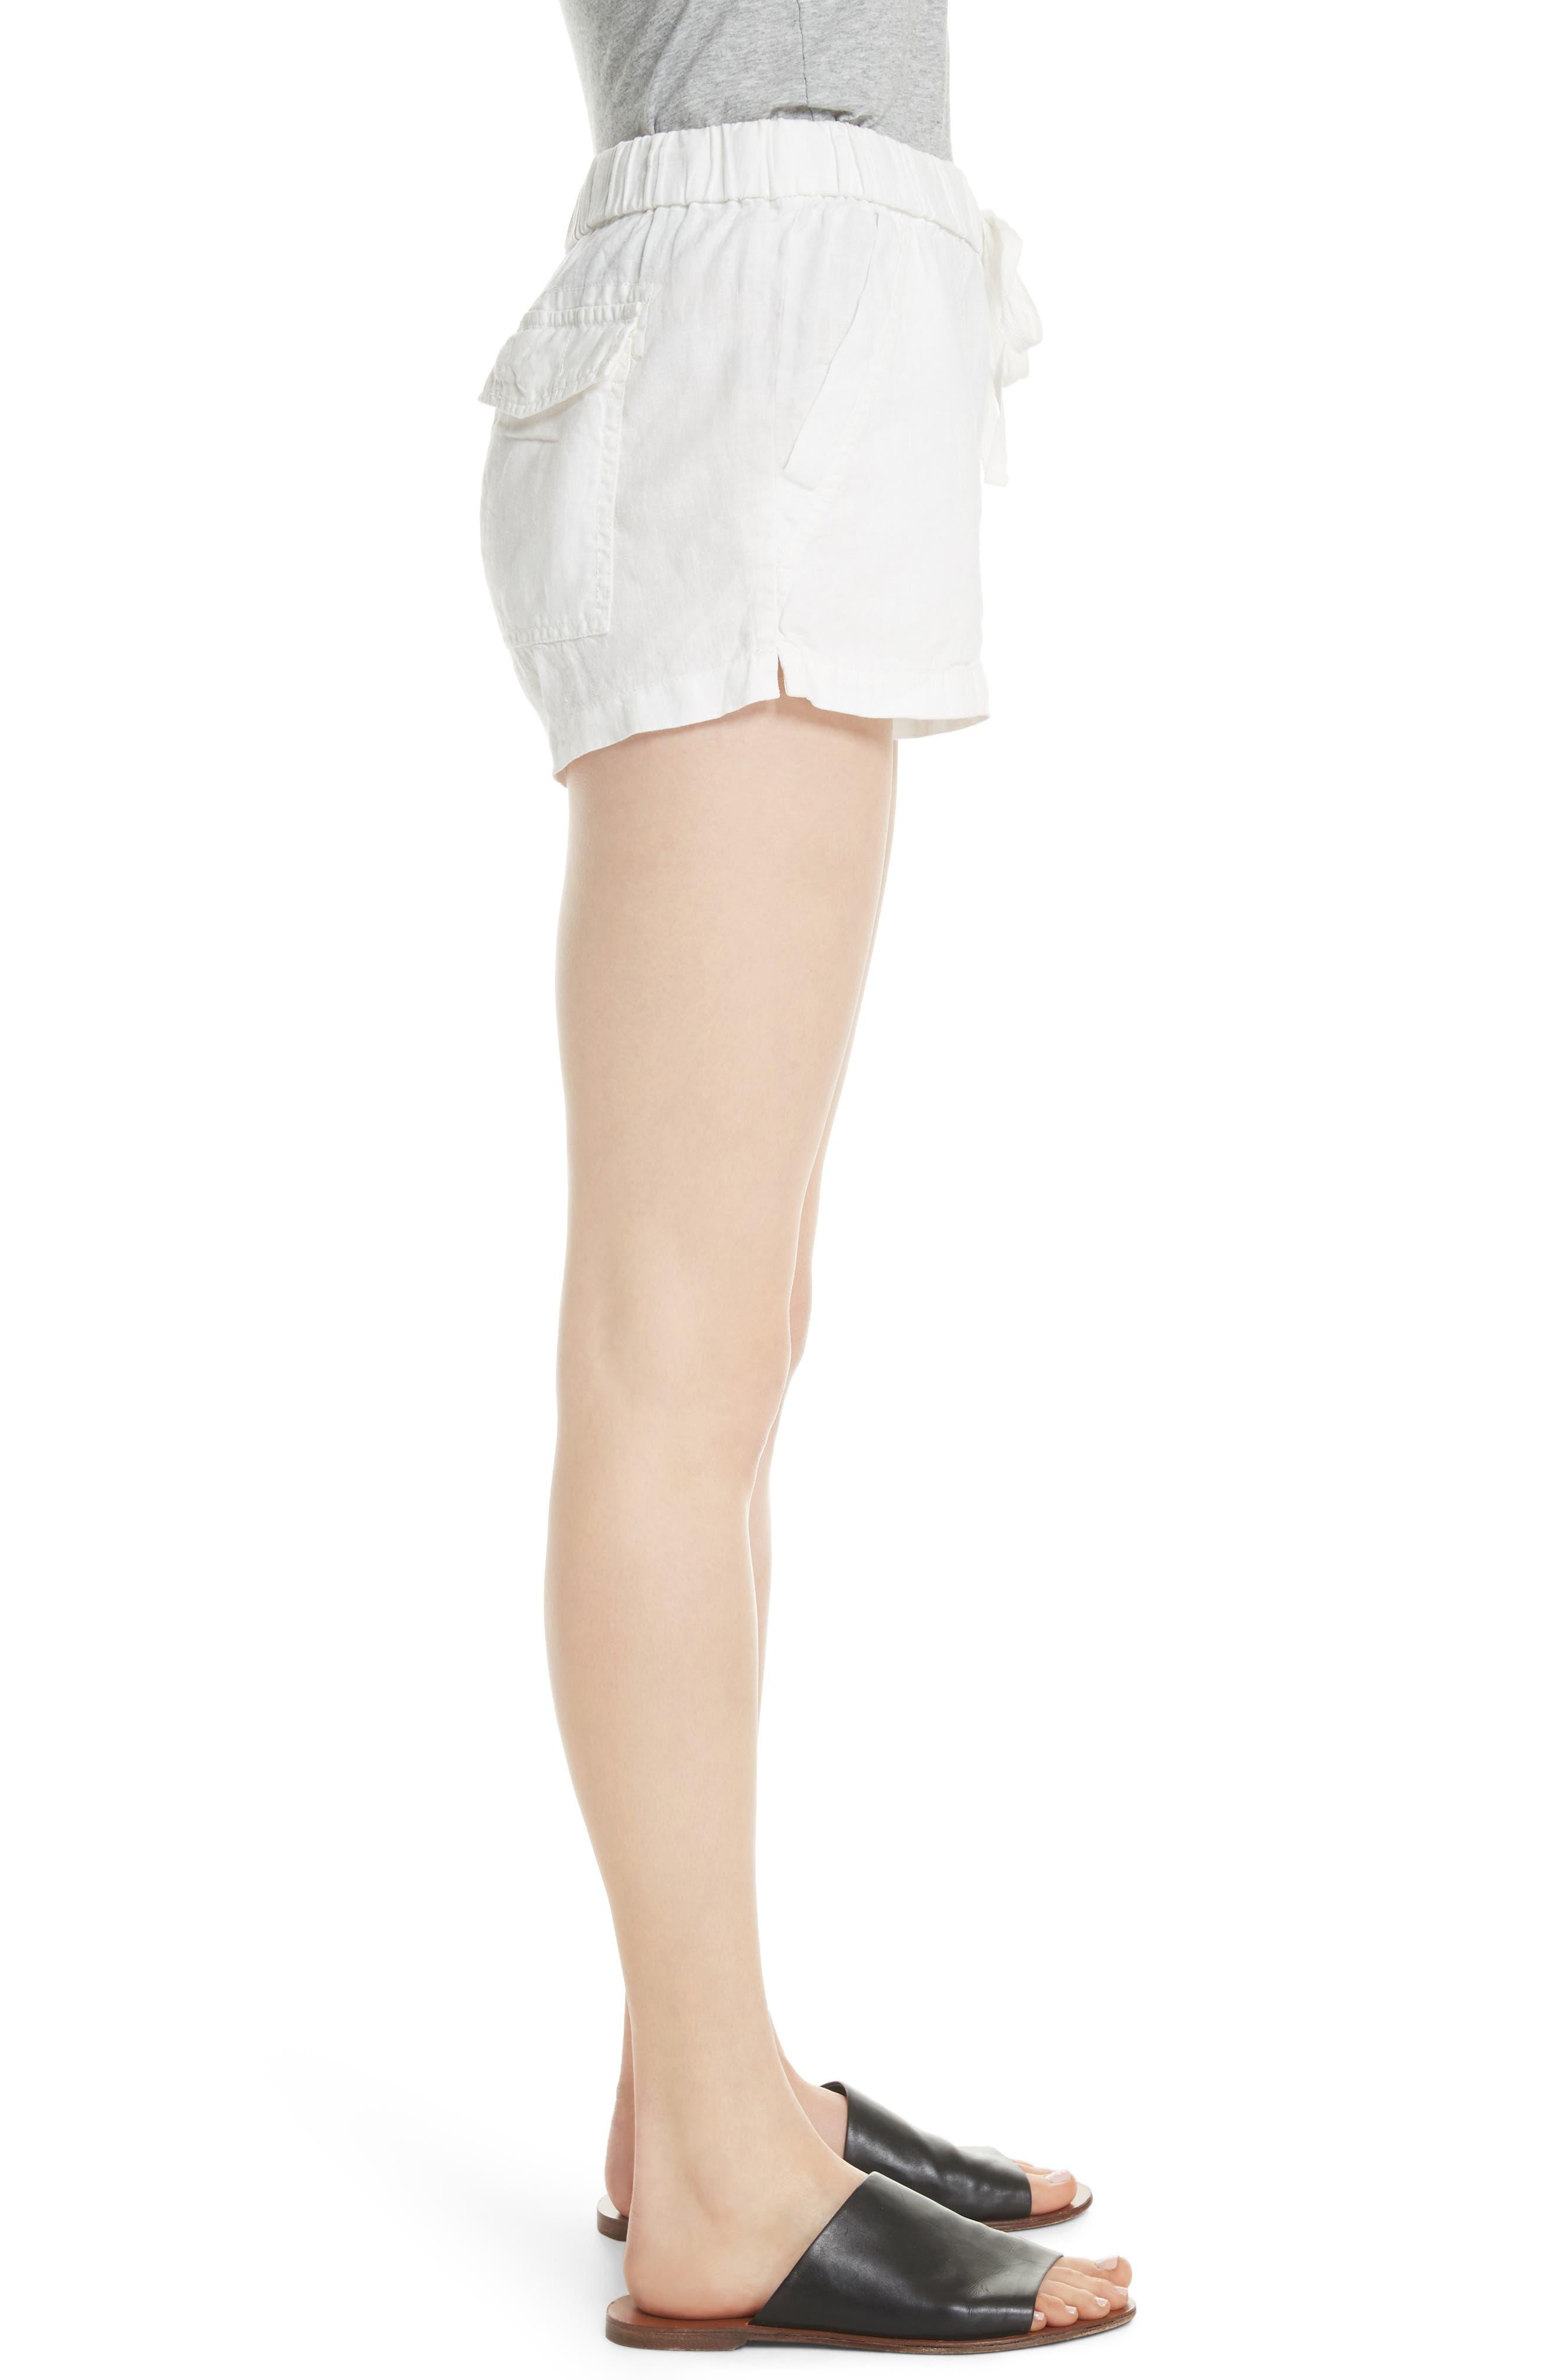 Fosette Linen Drawstring Shorts,                             Alternate thumbnail 3, color,                             Porcelain